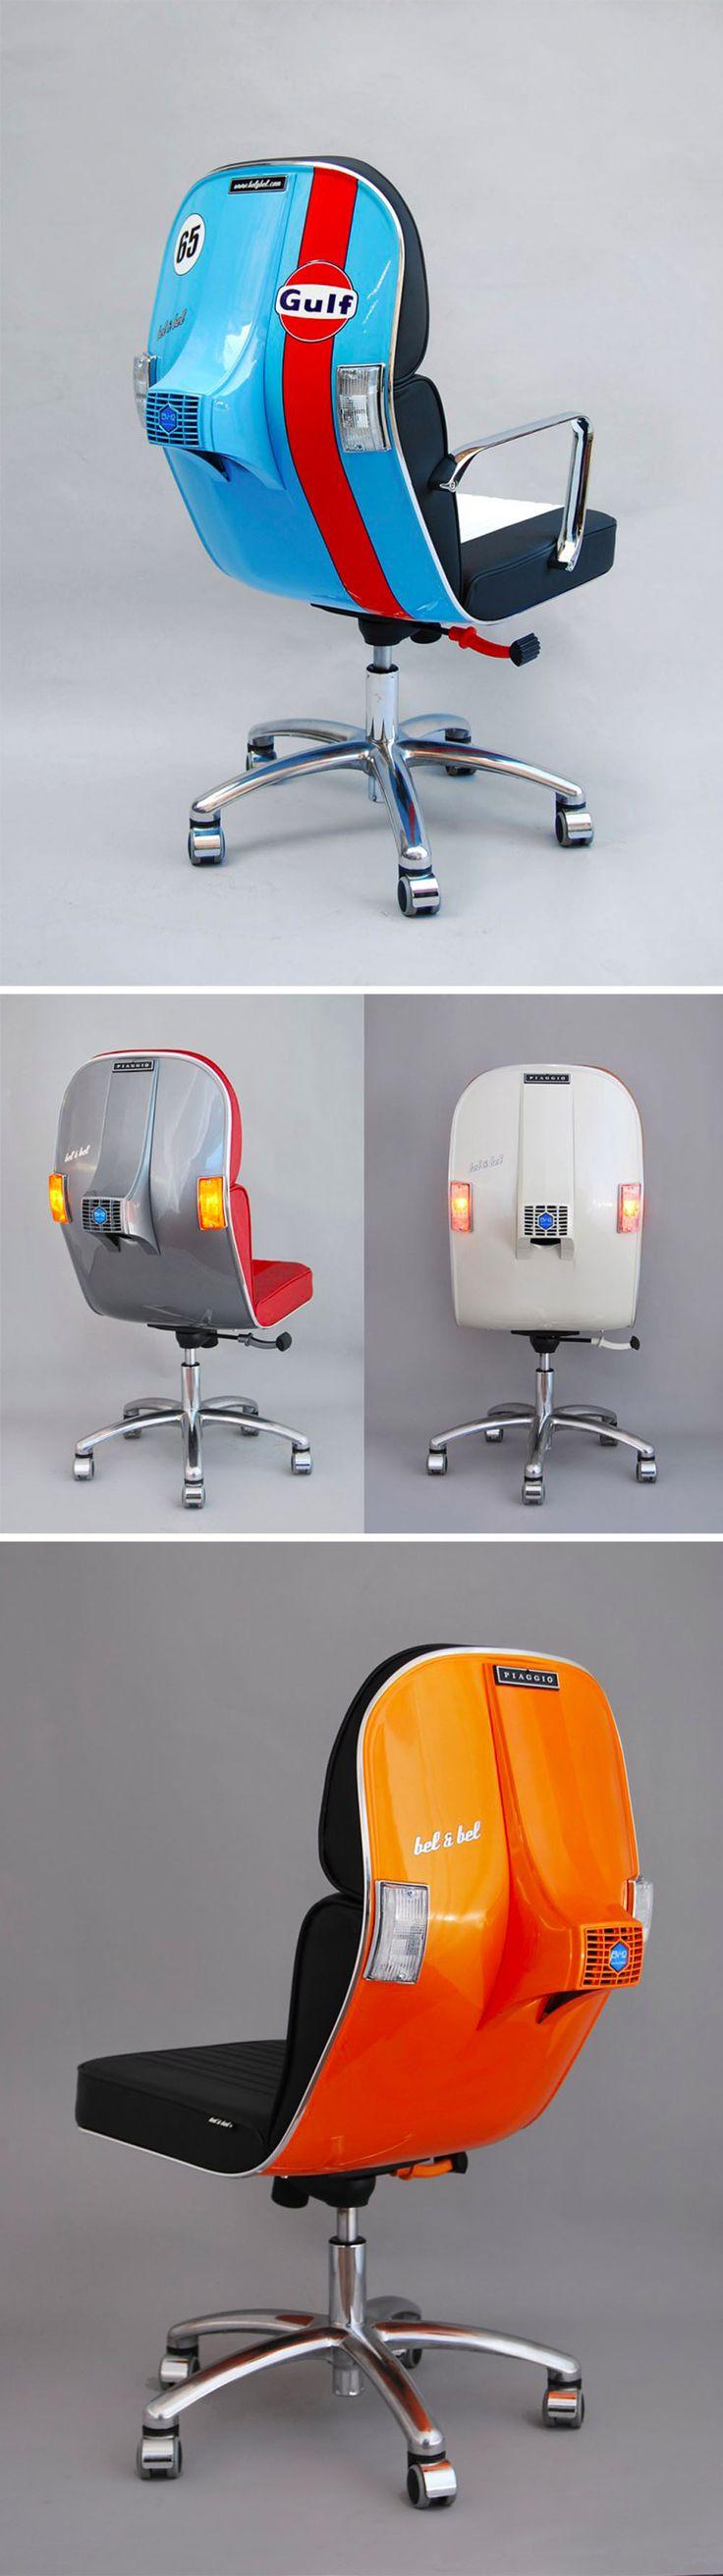 Vintage Vespa Parts Recontextualized as Sleek Modern Office Furniture